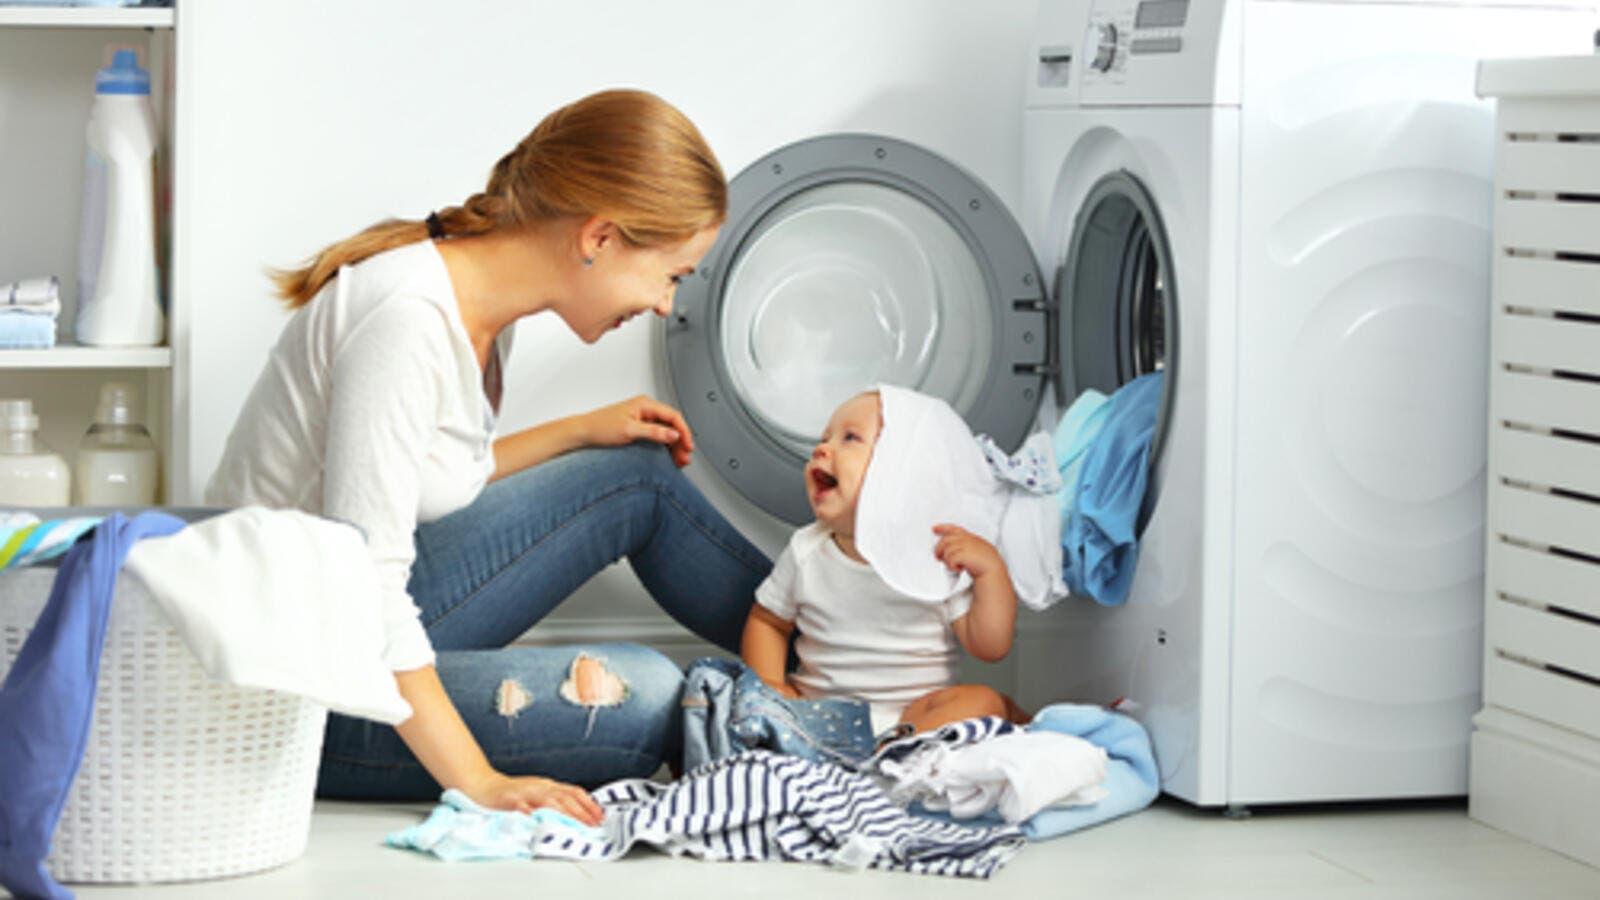 cde8da2b063f9 قبل أن تغسلي ملابس طفلك، اقرئي هذا المقال!